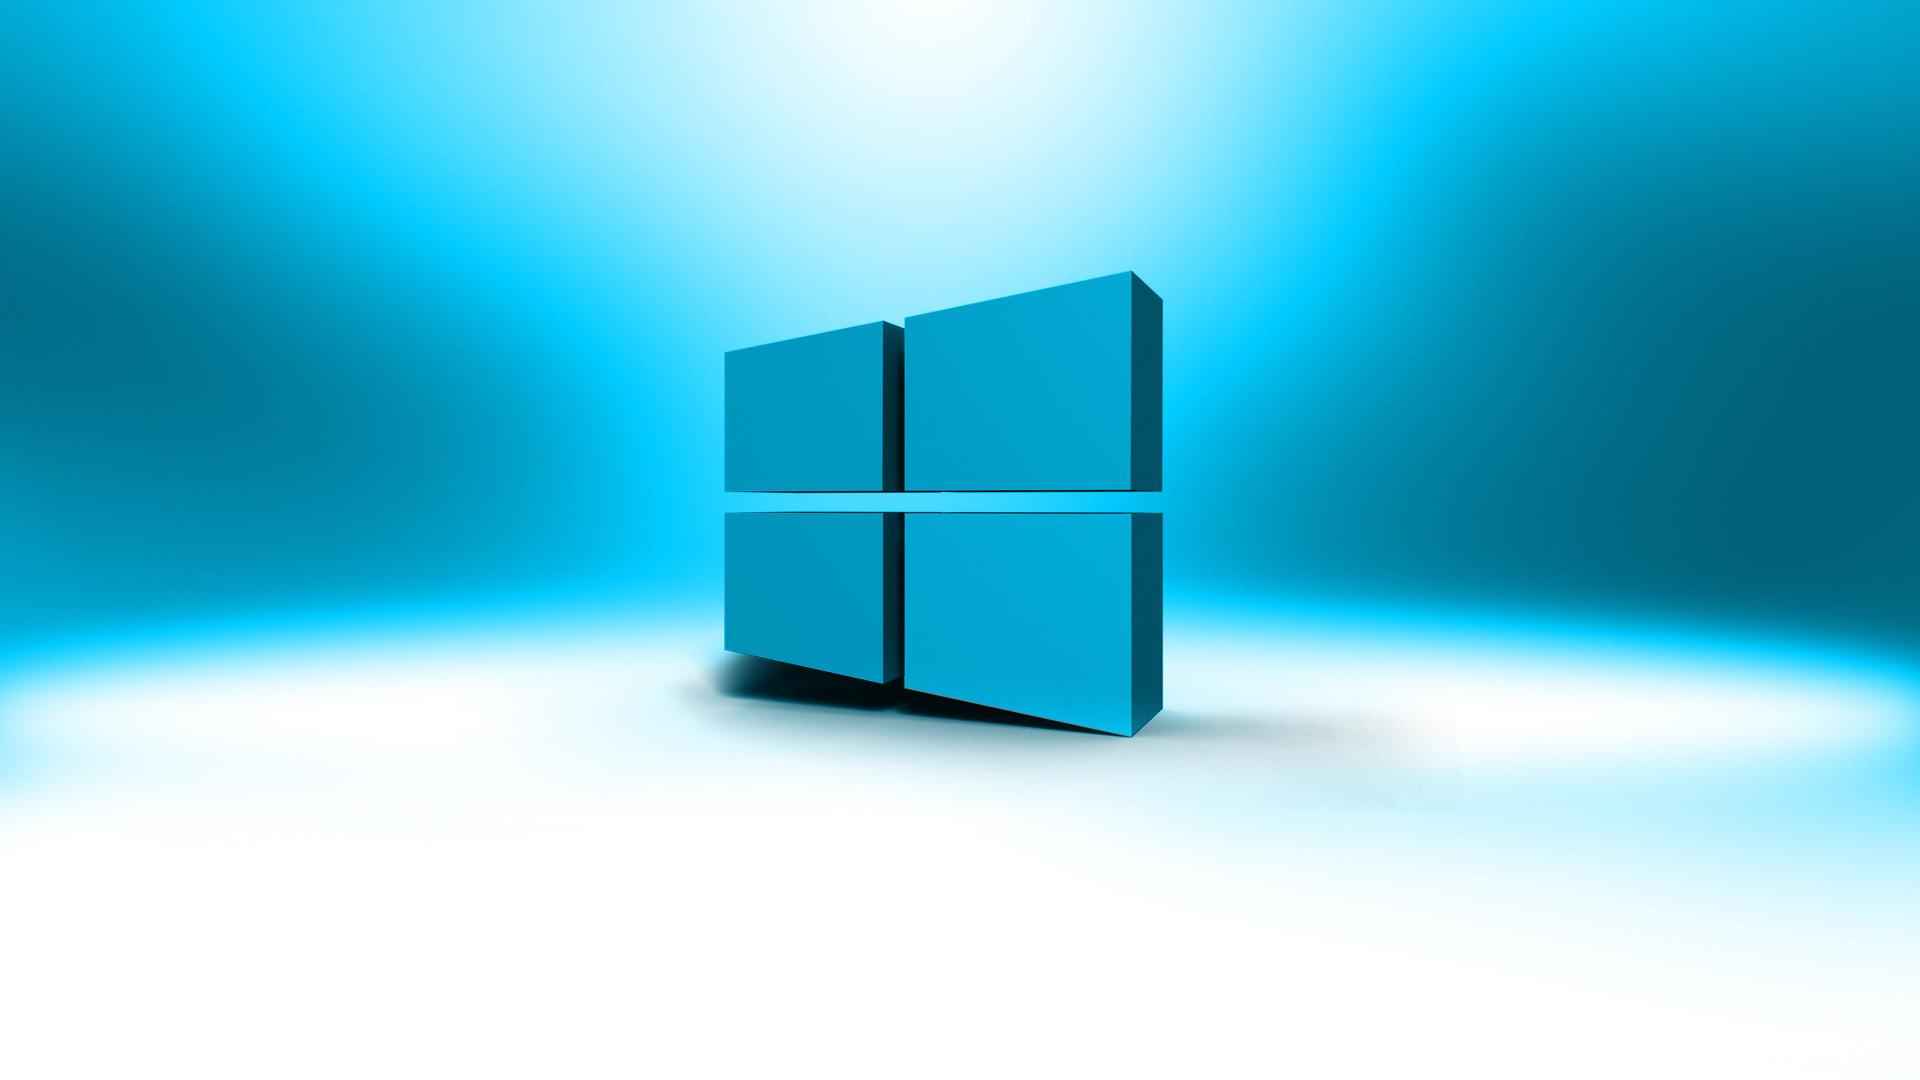 Windows HD desktop wallpaper High Definition Fullscreen Mobile